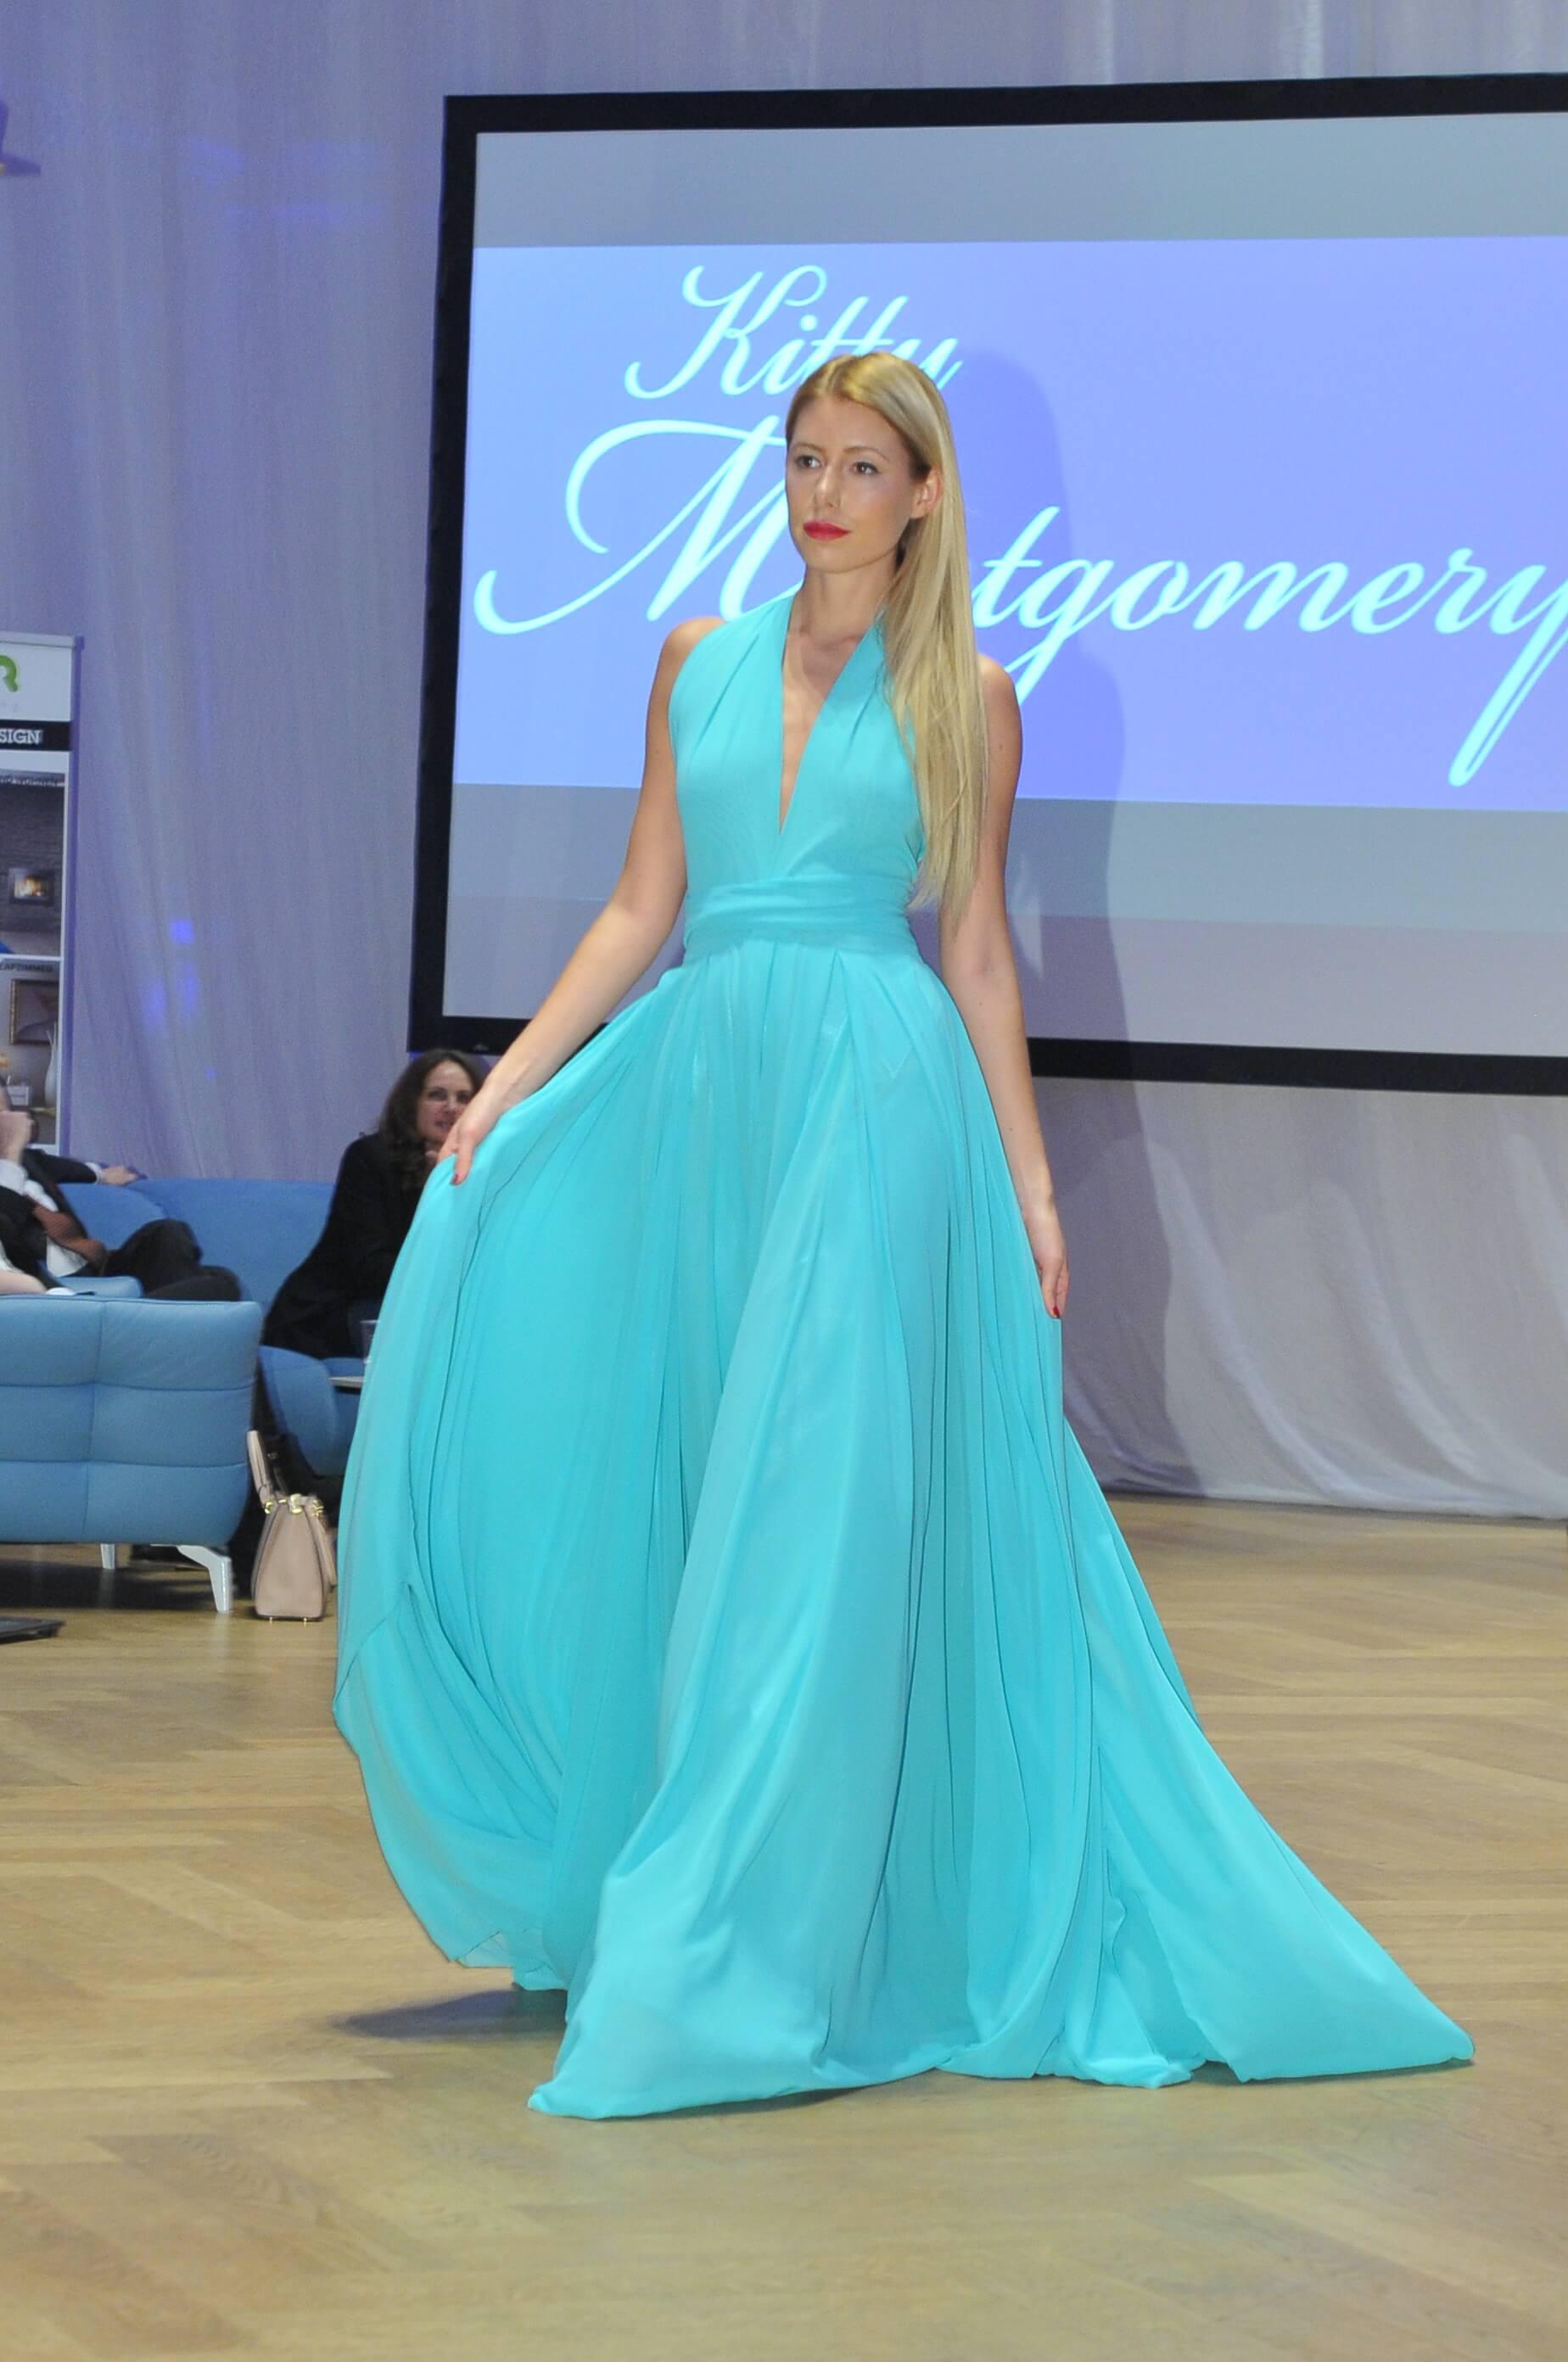 Kitty Montgomery French Fashion Week 2018 Philipp Hutter